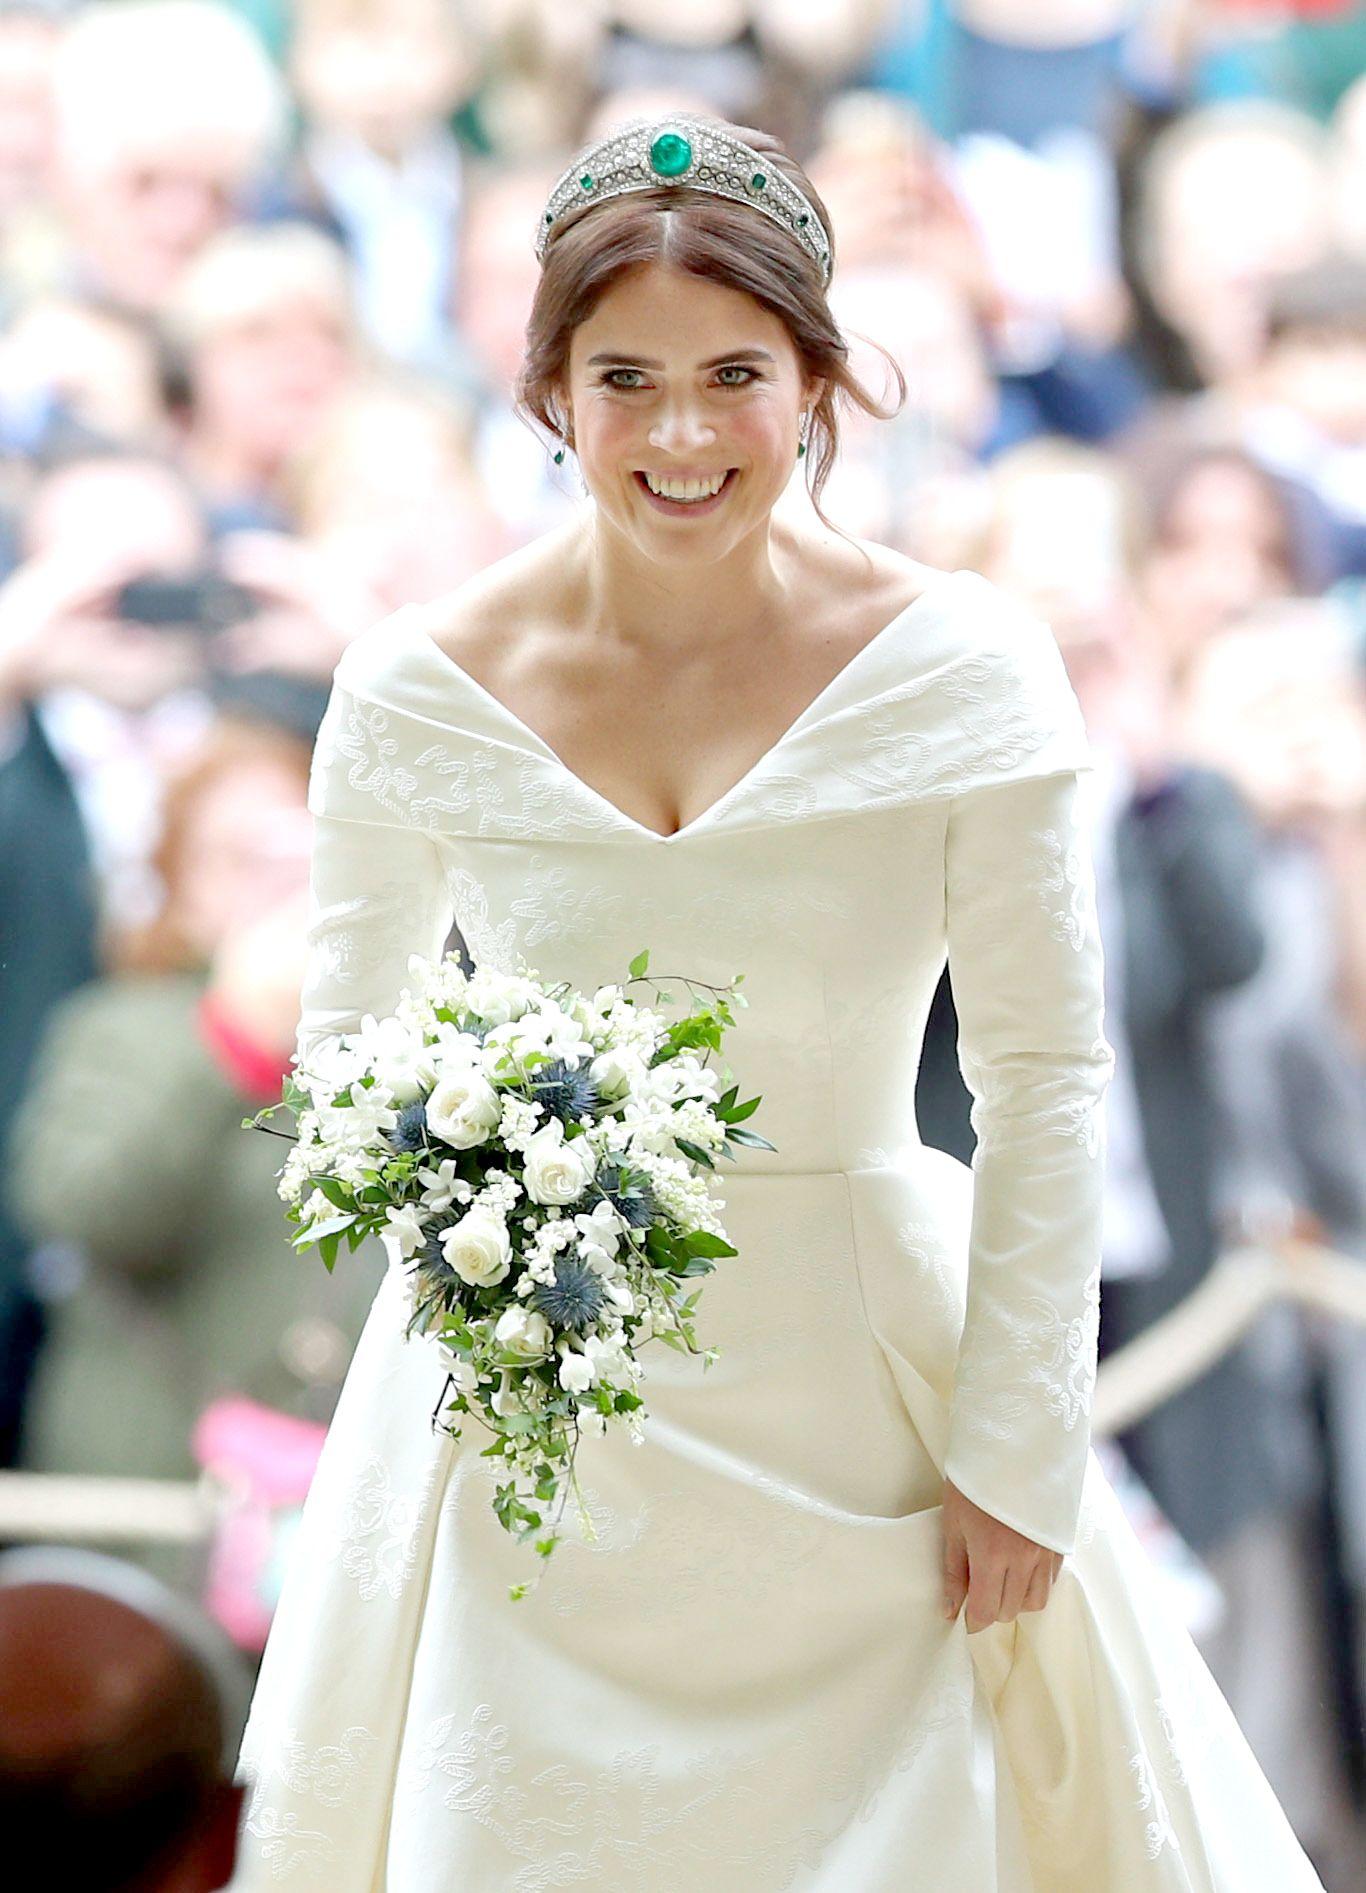 Princess Eugenie's Second Wedding Dress Will Make Your Jaw